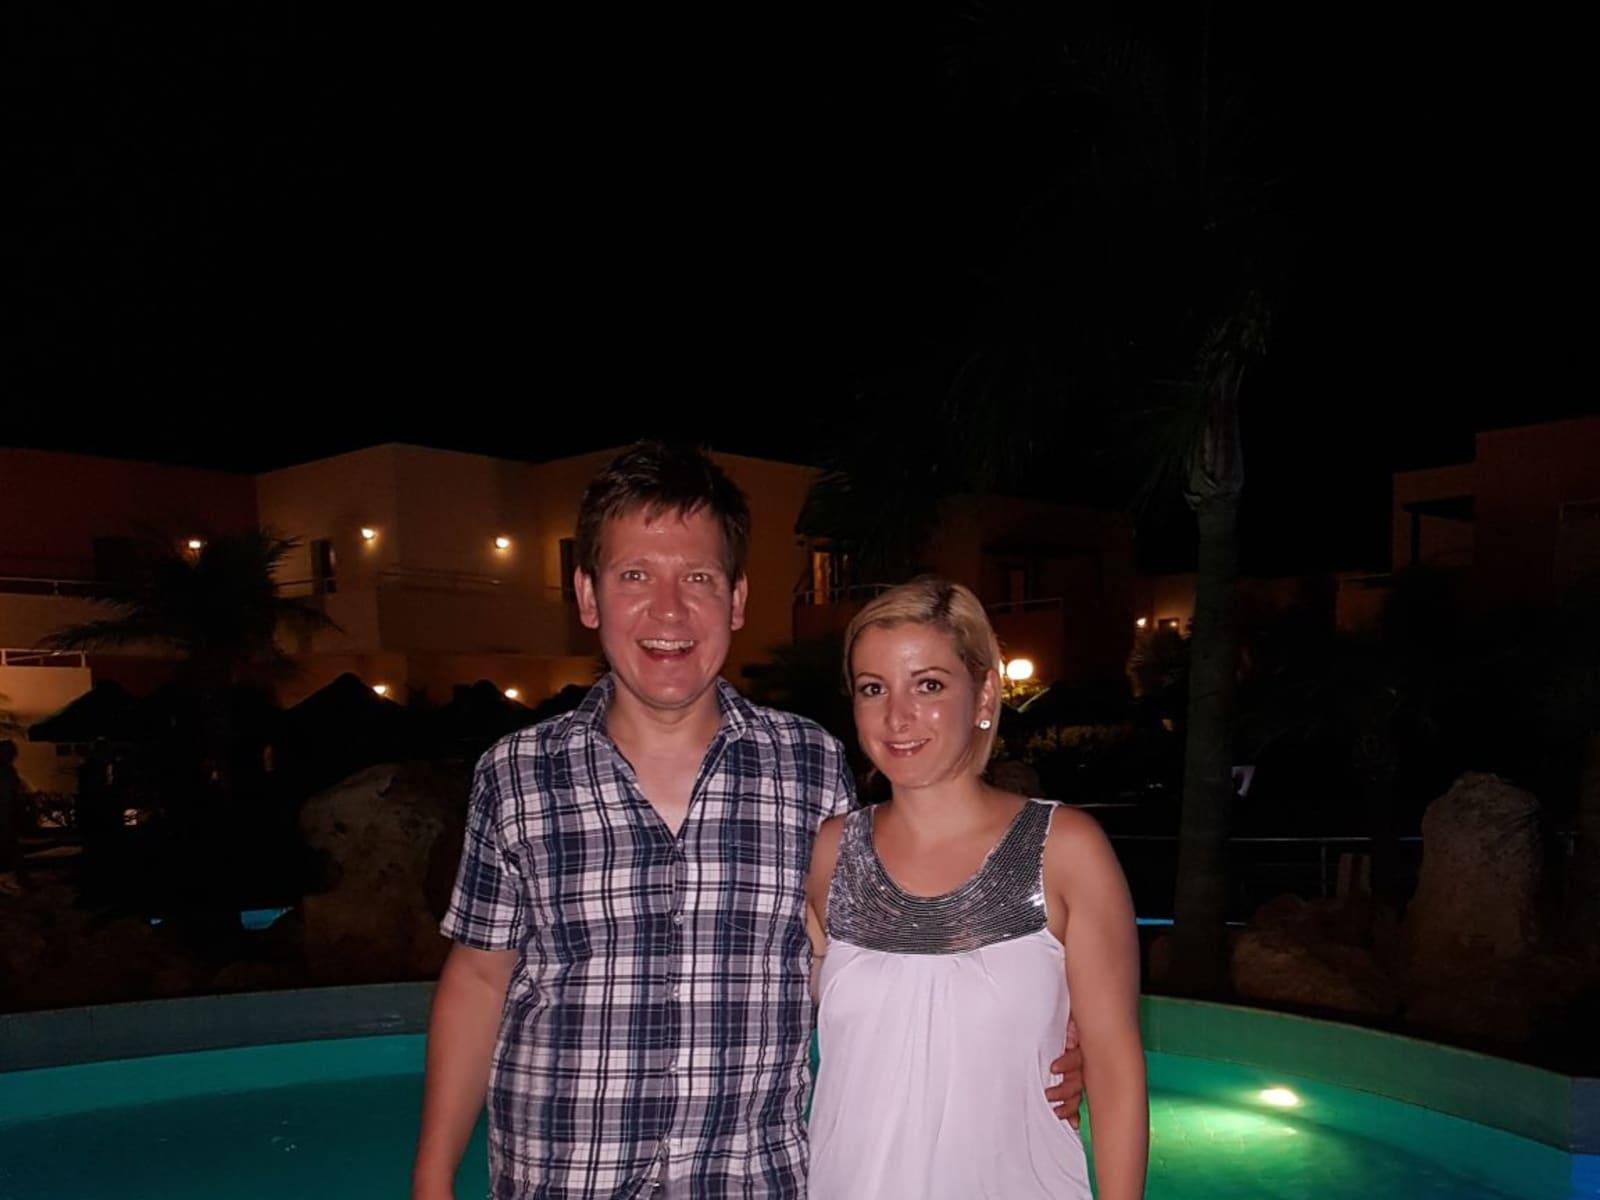 Michael & Bettina from Paderborn, Germany